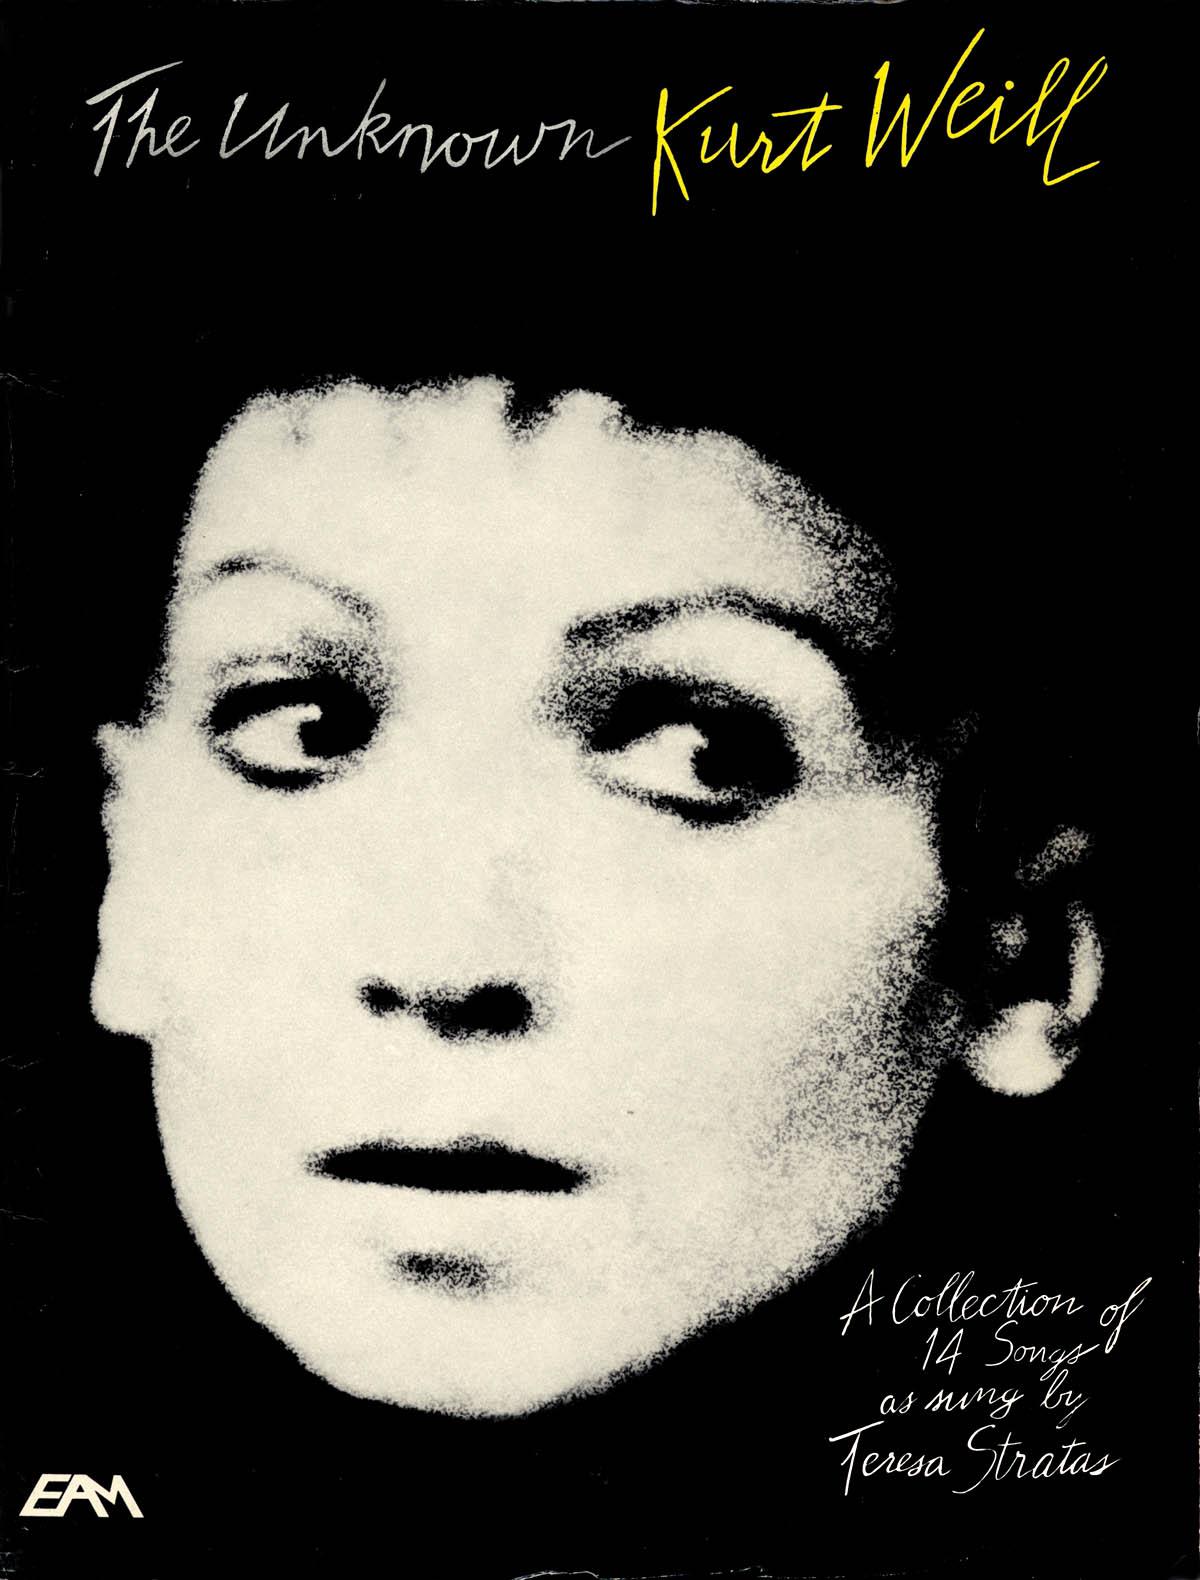 Kurt Weill: The Unknown Kurt Weill: Vocal: Vocal Album